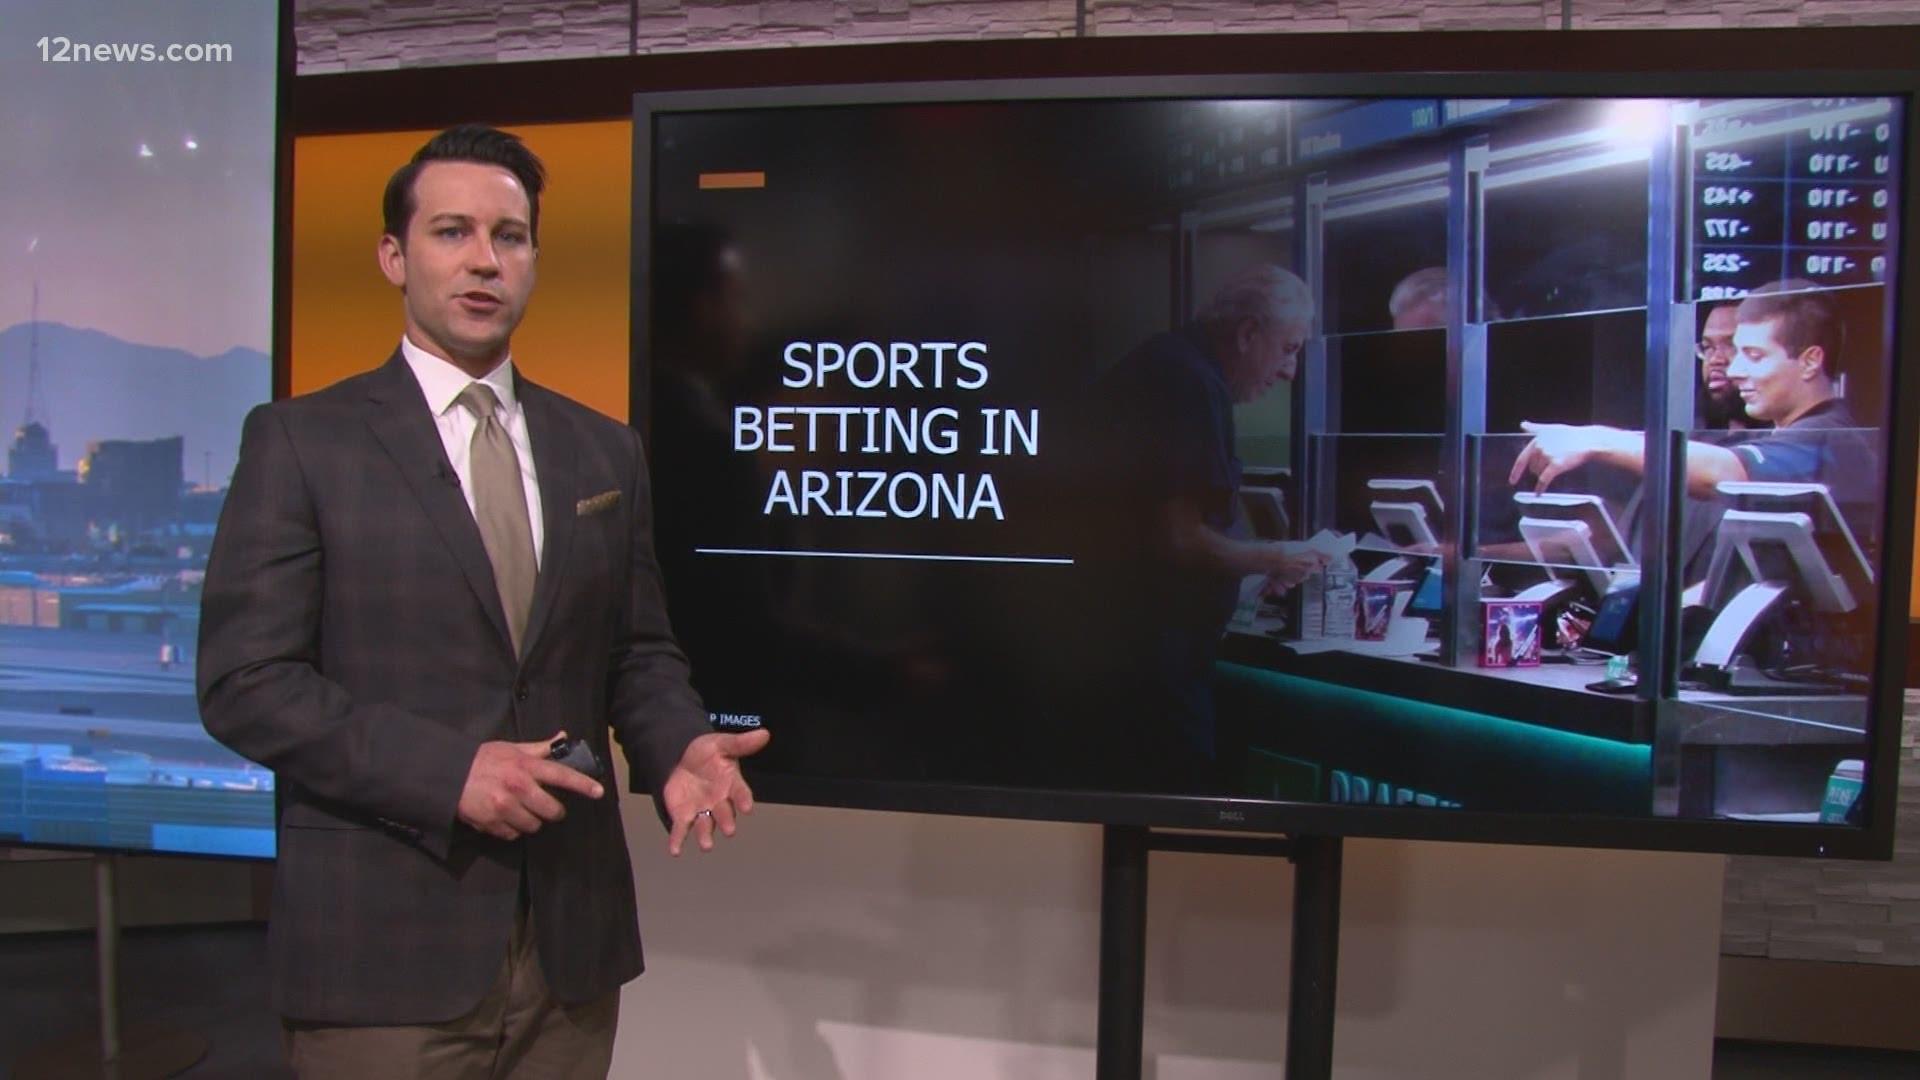 Is arizona intetested in sports betting flakey dove champion hurdle betting